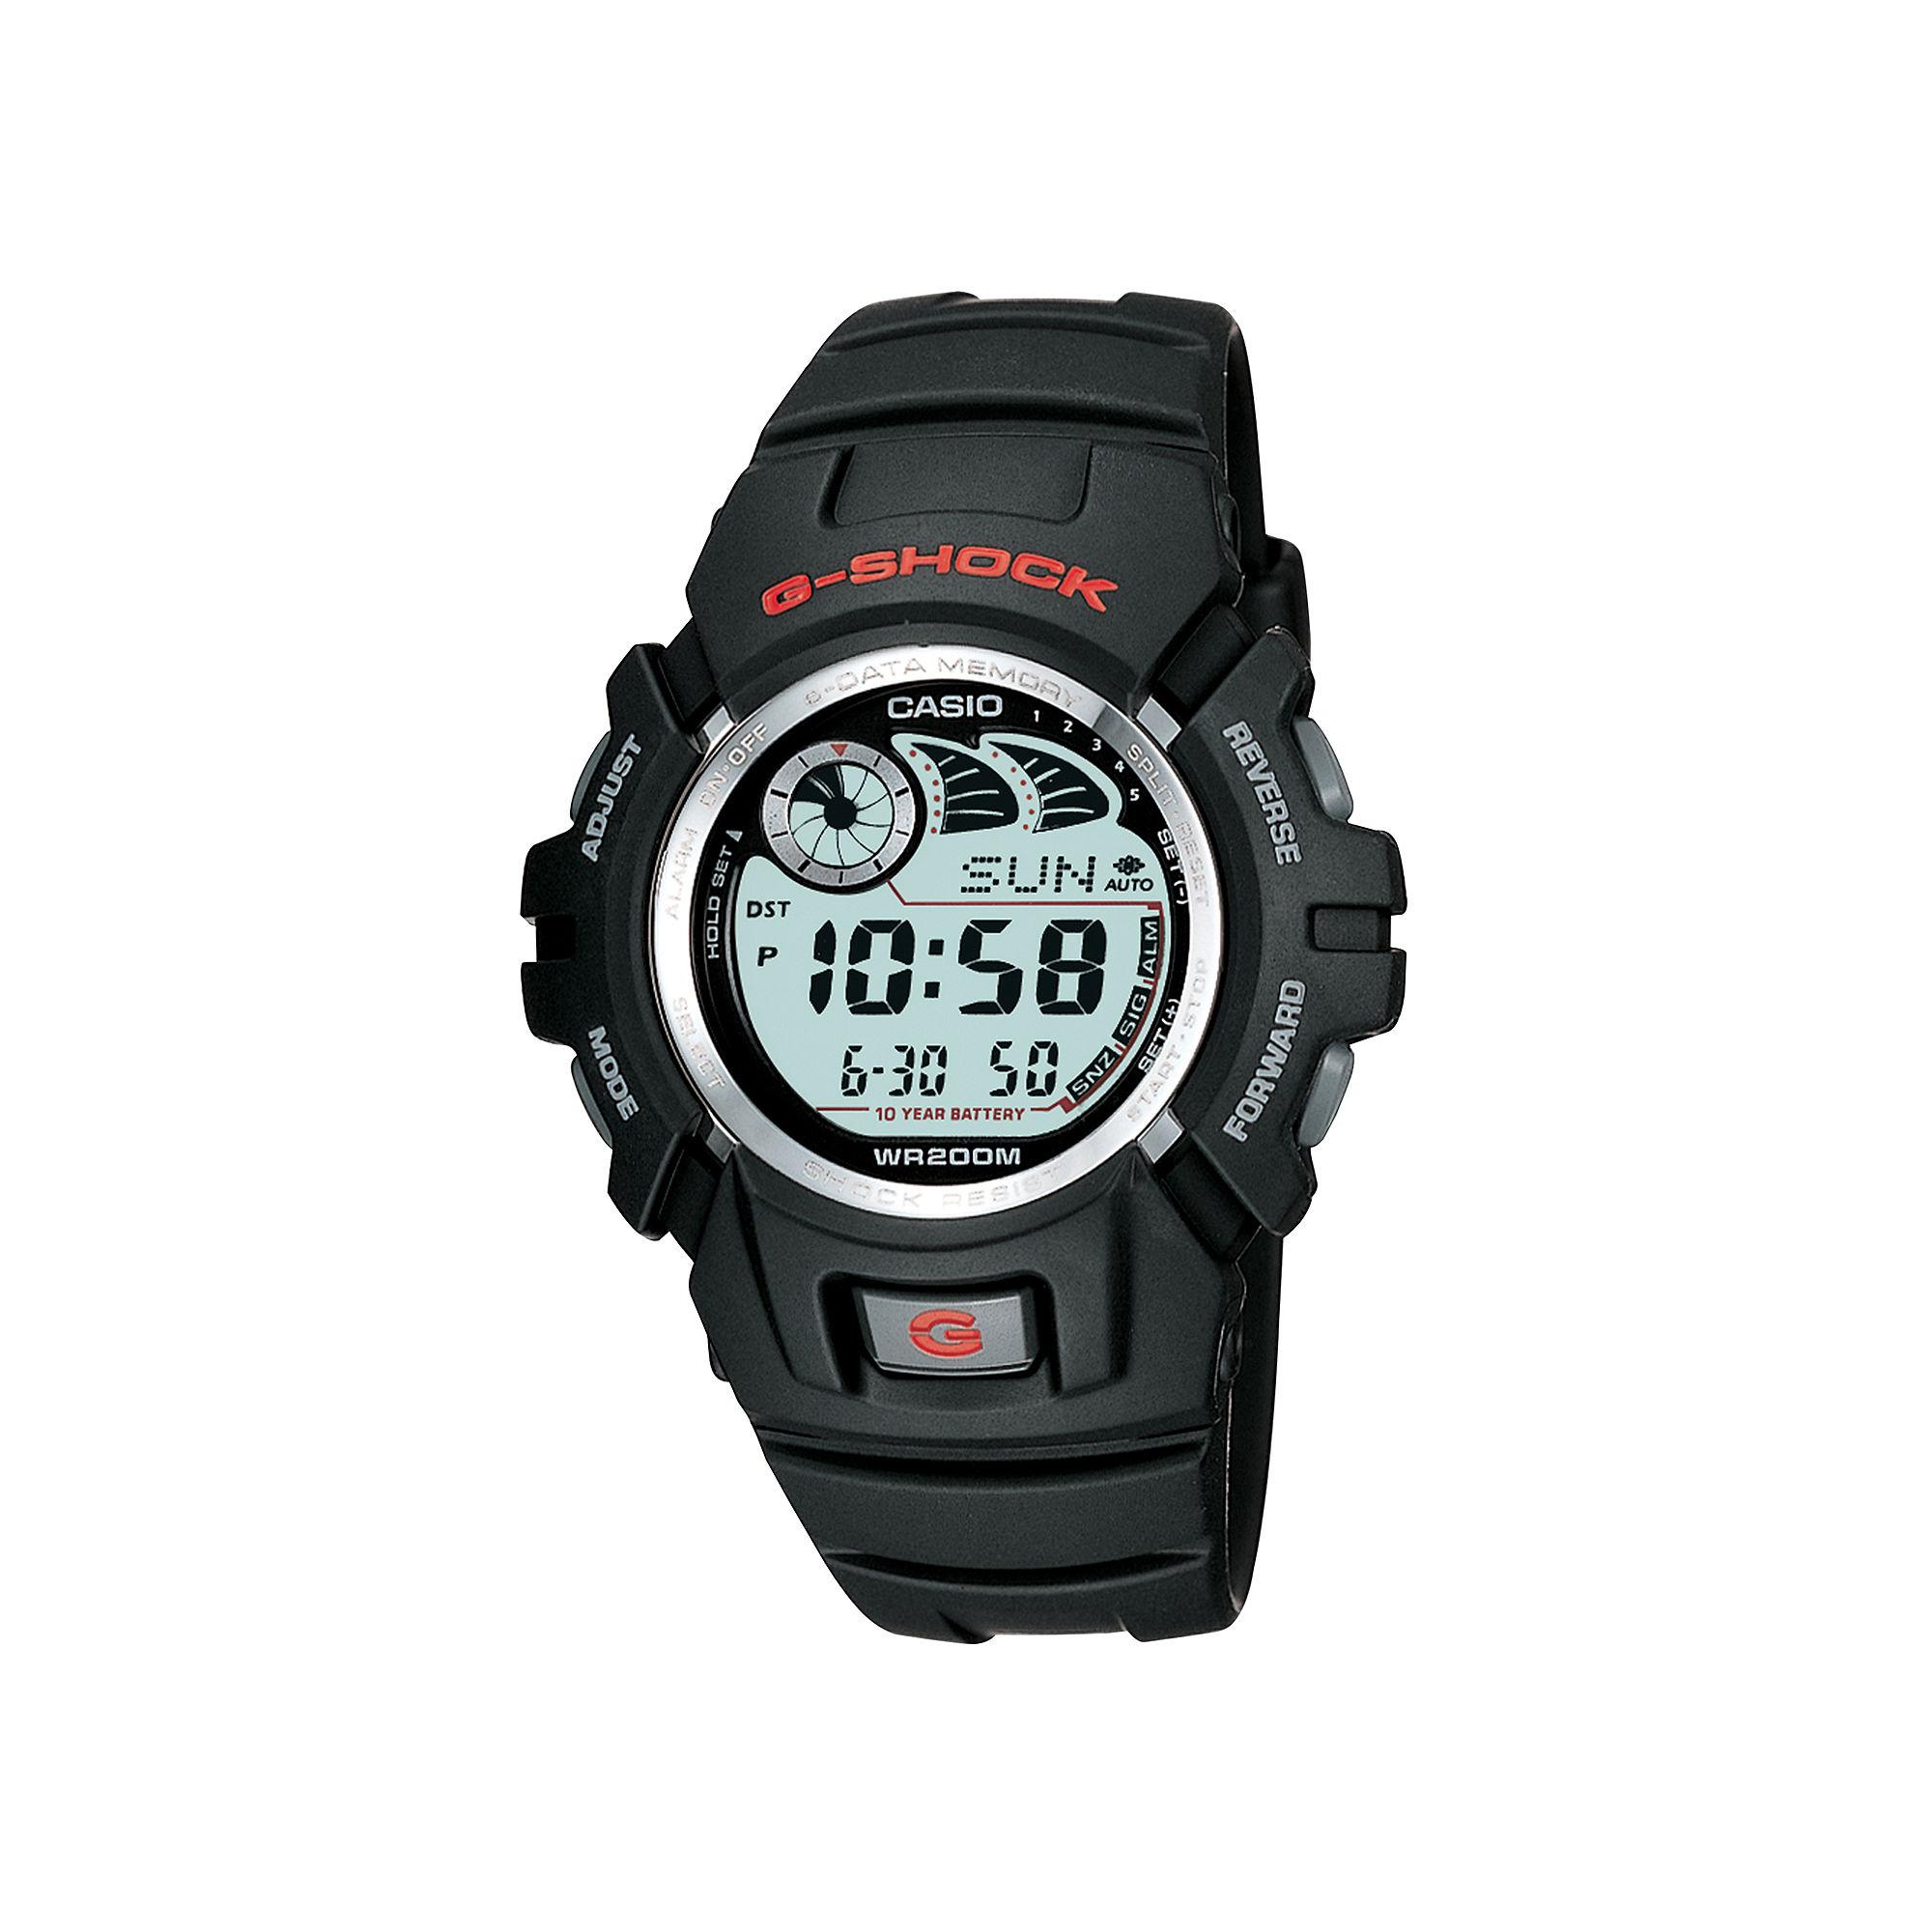 Casio G-Shock Mens E-Data Digital Watch G2900F-1V